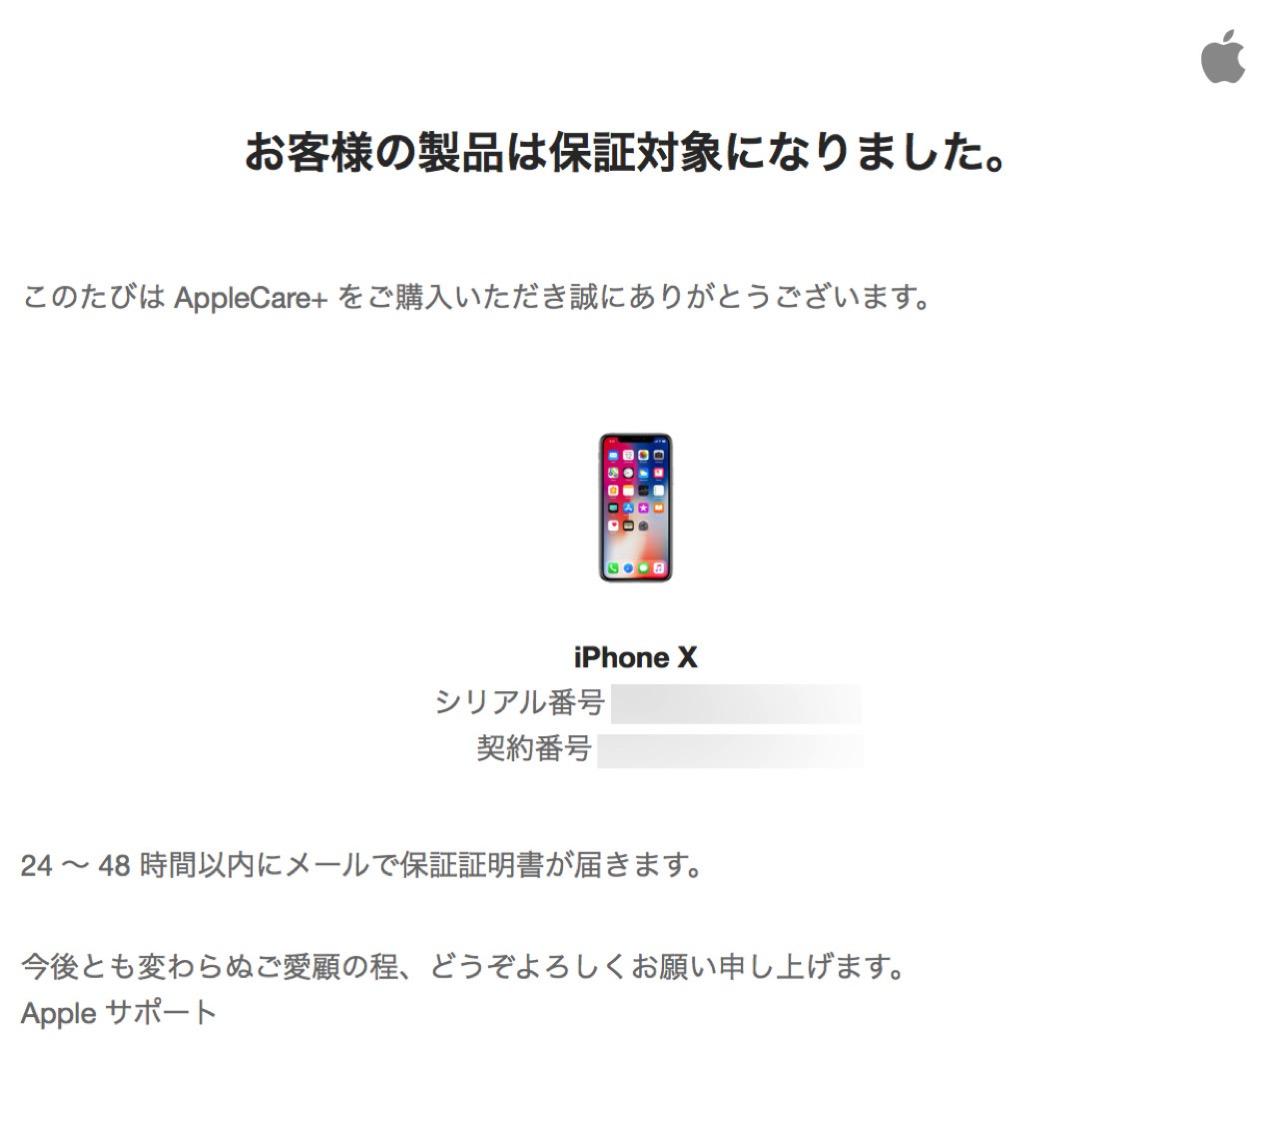 「AppleCare+」登録完了の確認